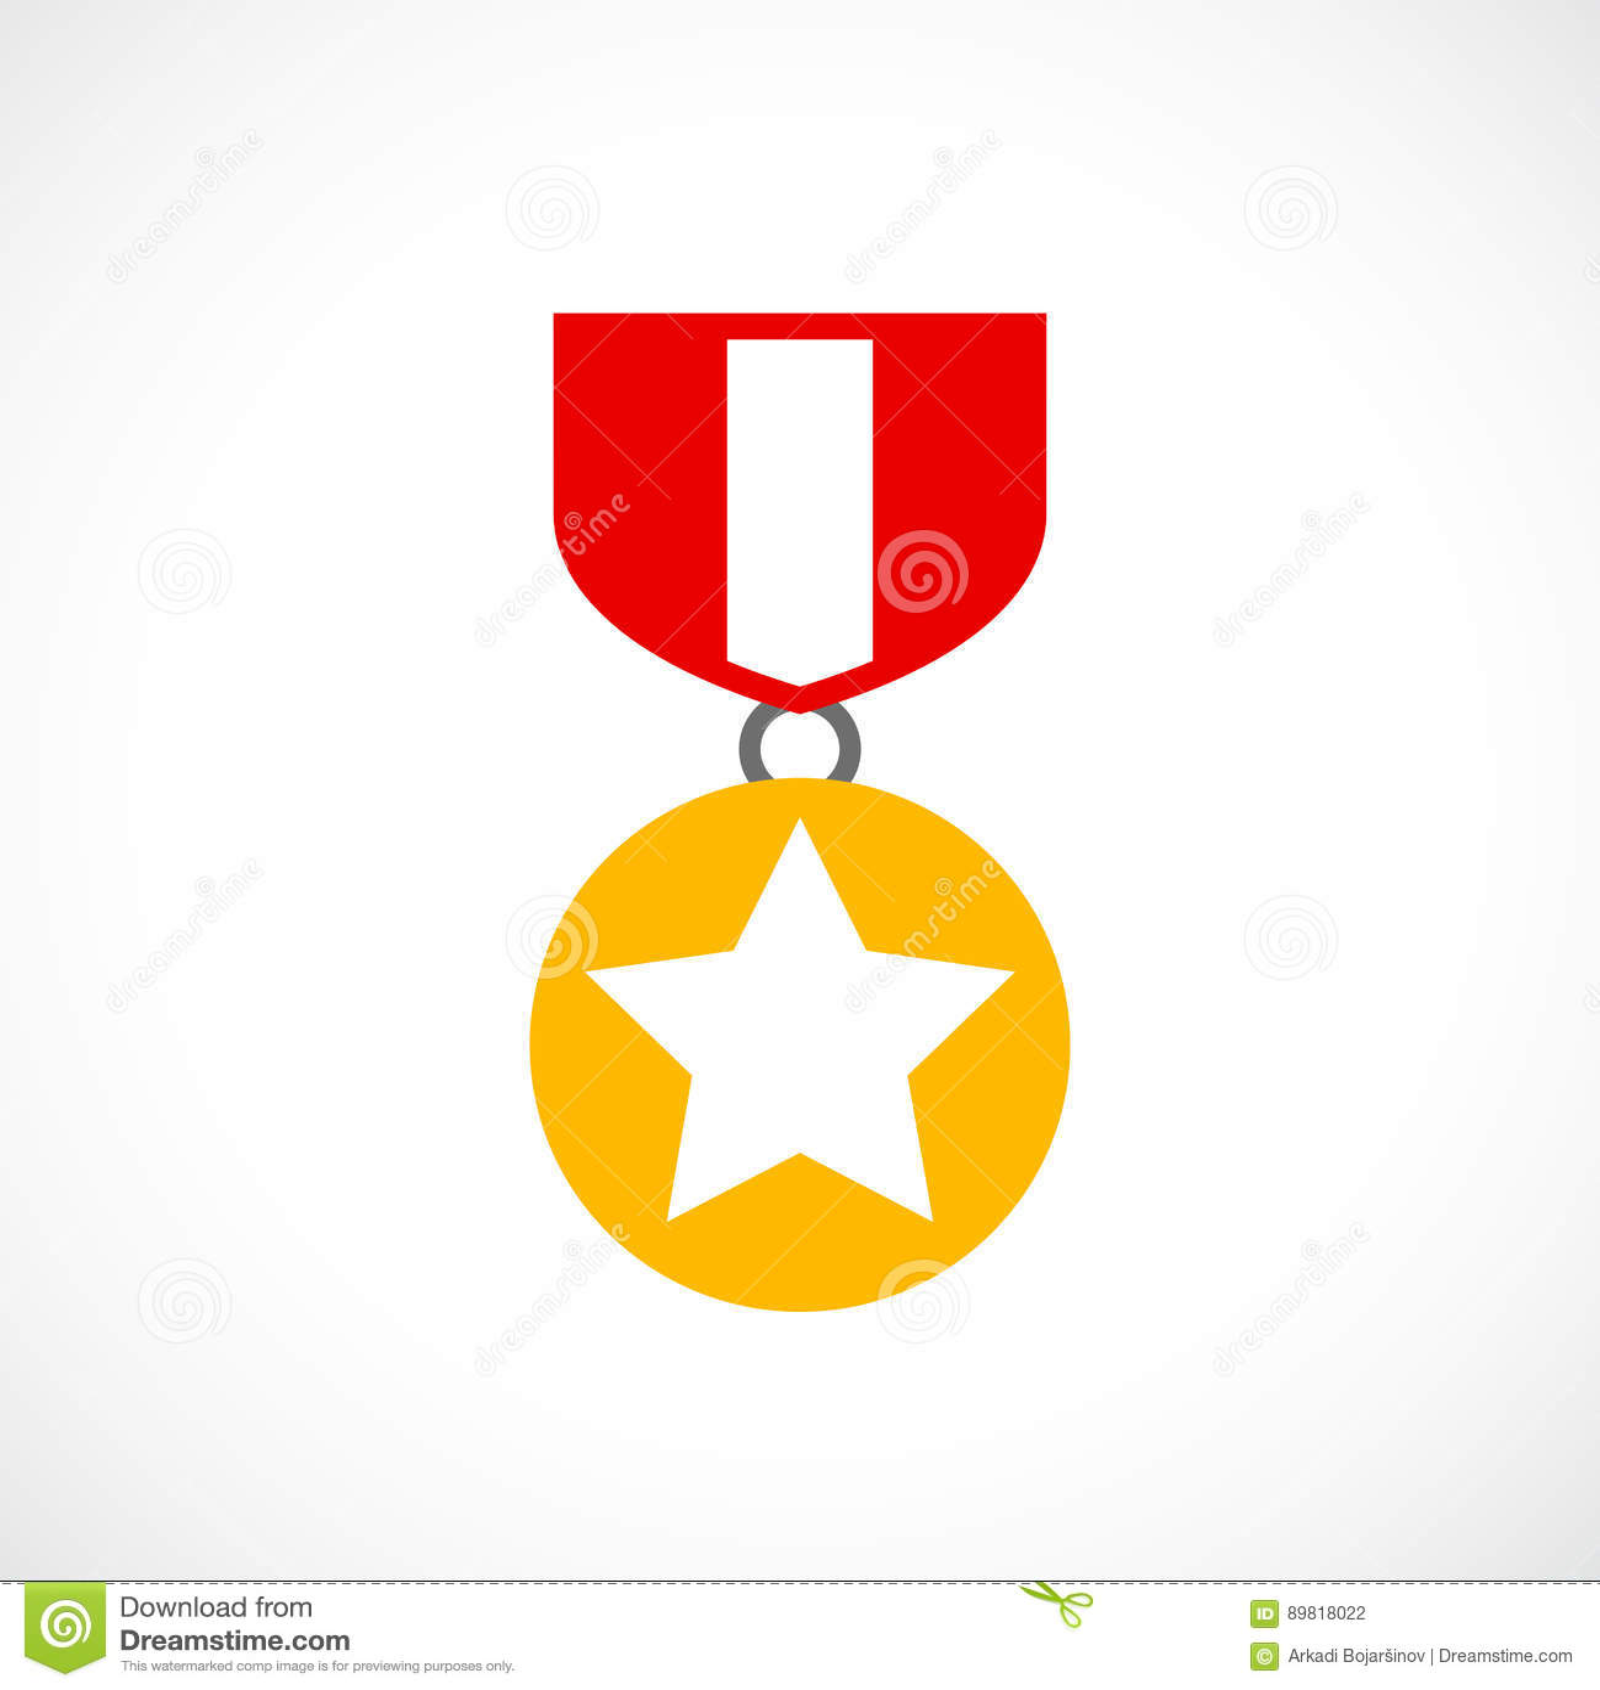 Award gold order icon